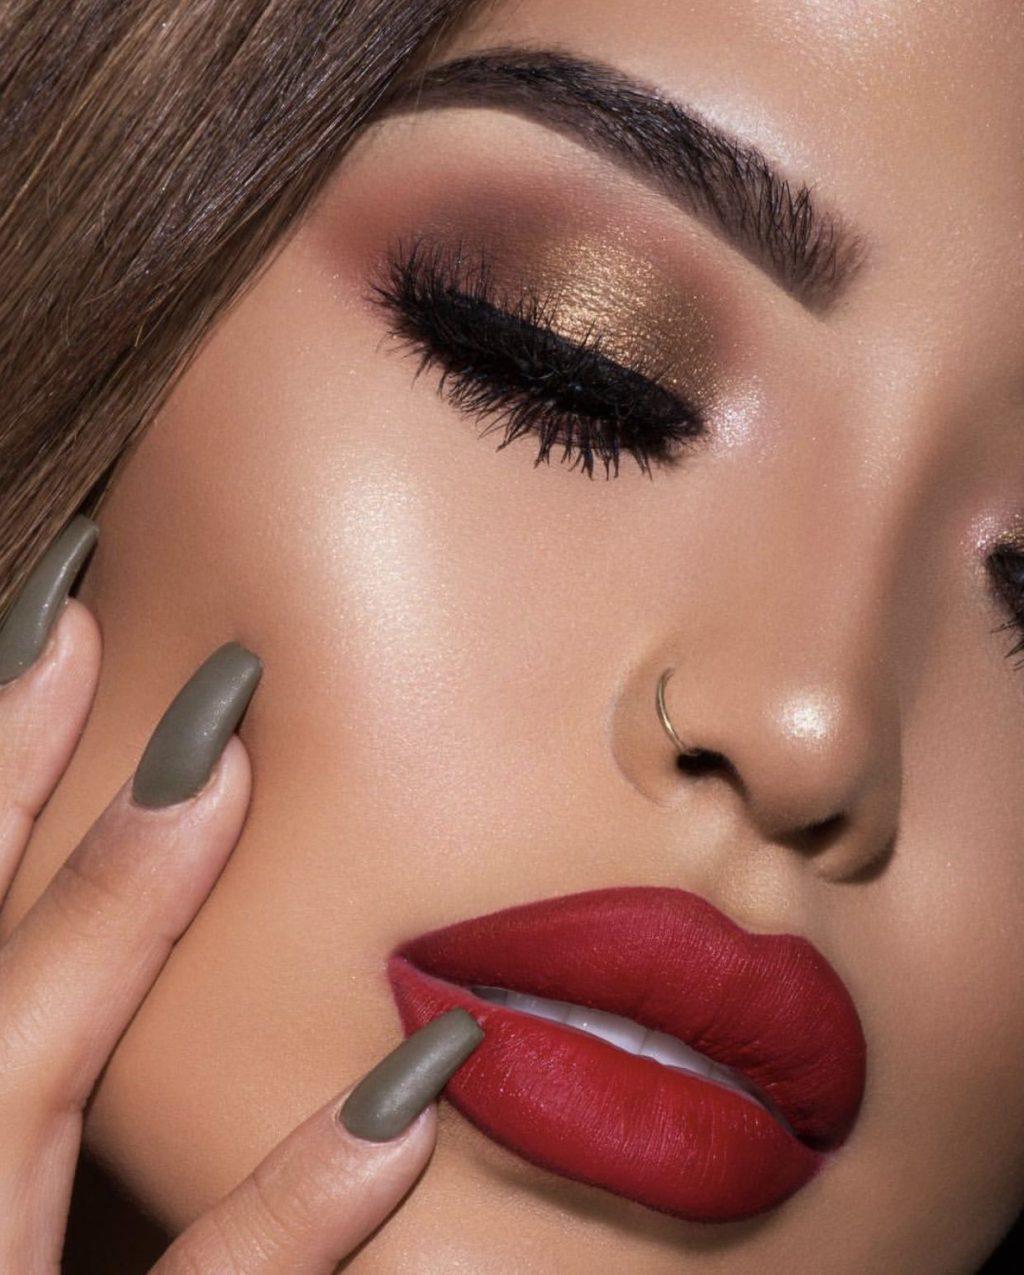 Golden-Smokey-Eye-make-up.-2-1024x1275 60+ Hottest Smokey Eye Makeup Looks in 2020